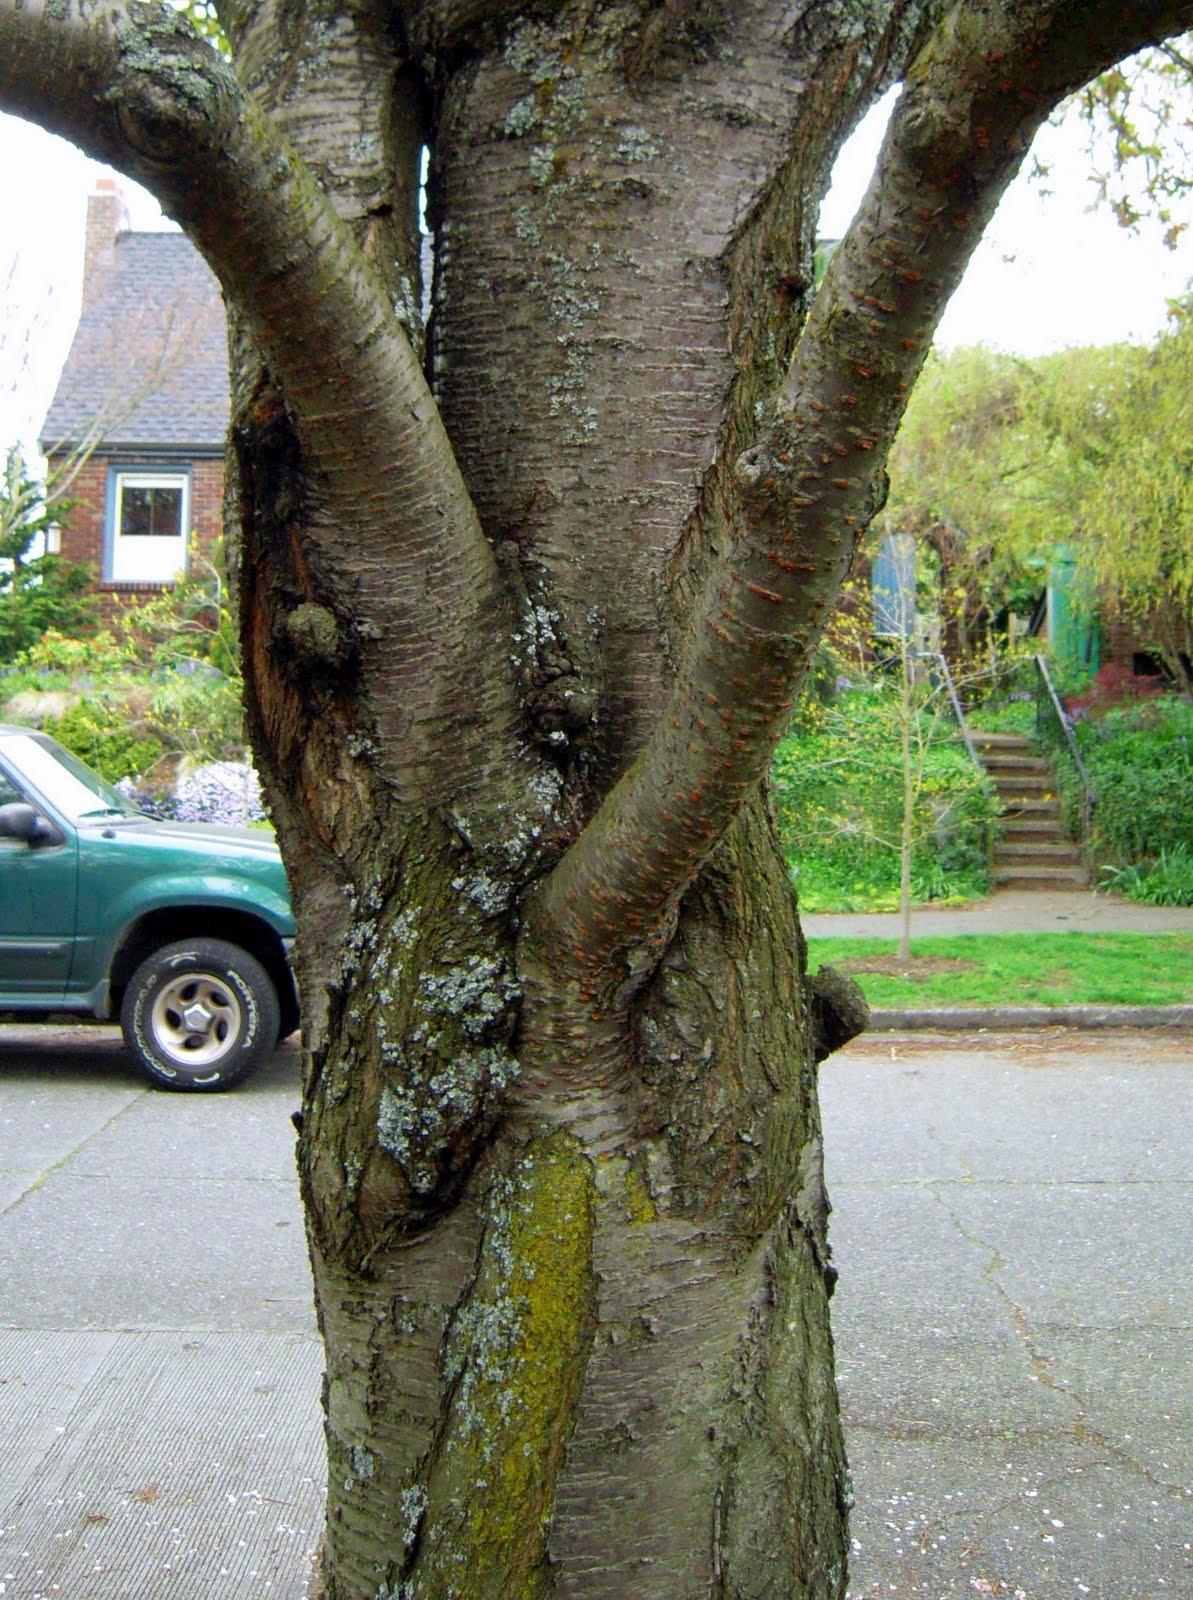 http://4.bp.blogspot.com/_Hd3A1l-B5os/S8QNw1fmAfI/AAAAAAAAAzc/zD1OYEEmZbE/s1600/cherry+tree+pink+and+white+trunk+zoom+in.jpg